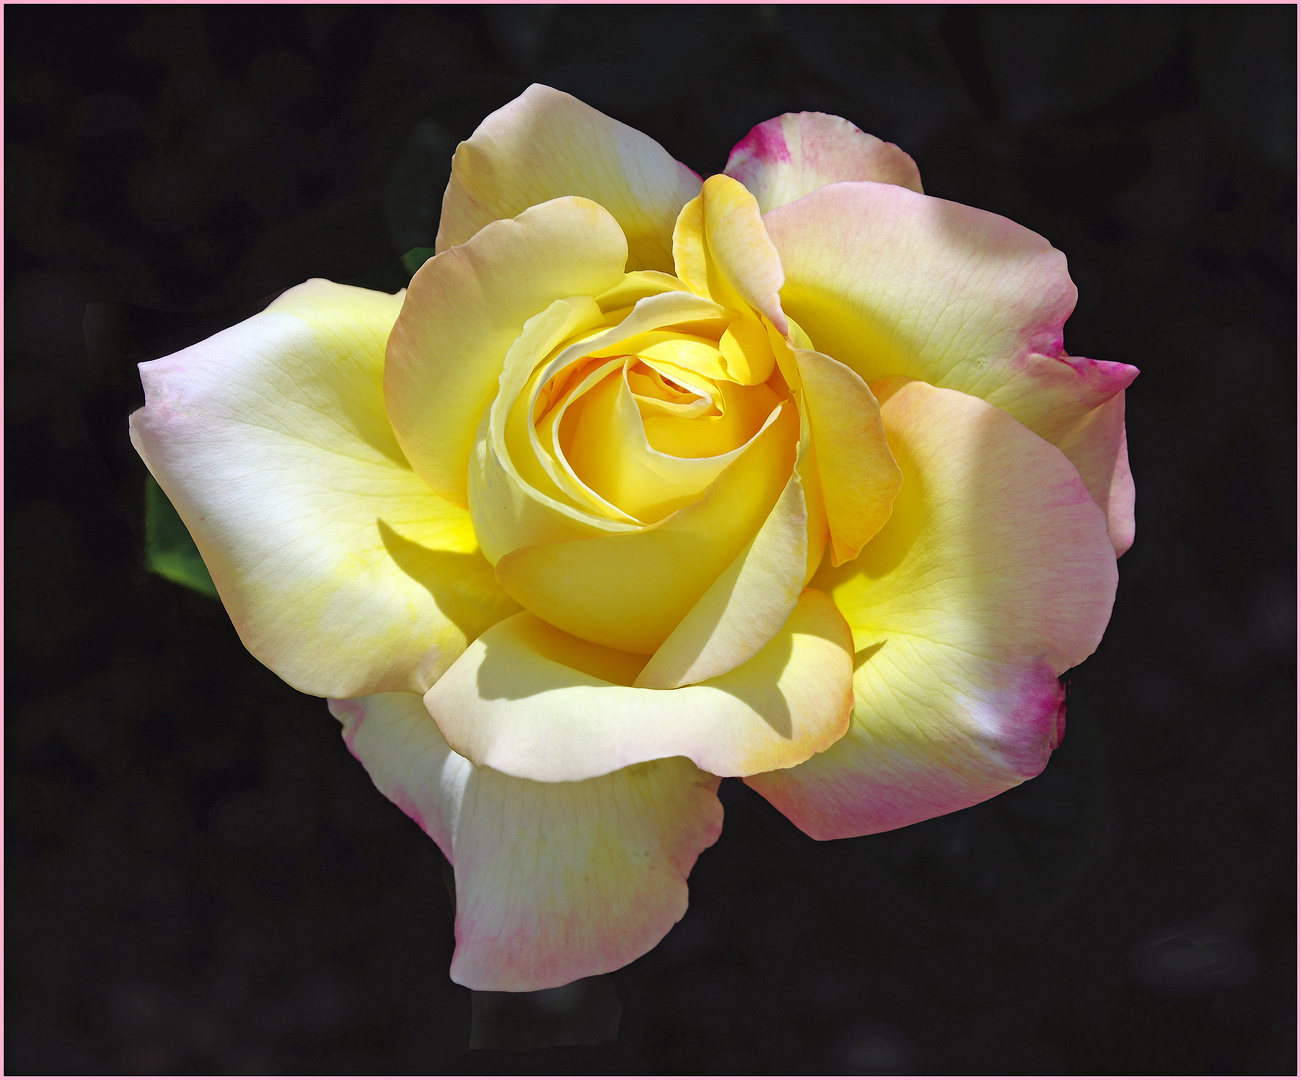 l important , c est la rose ...chantait becaud